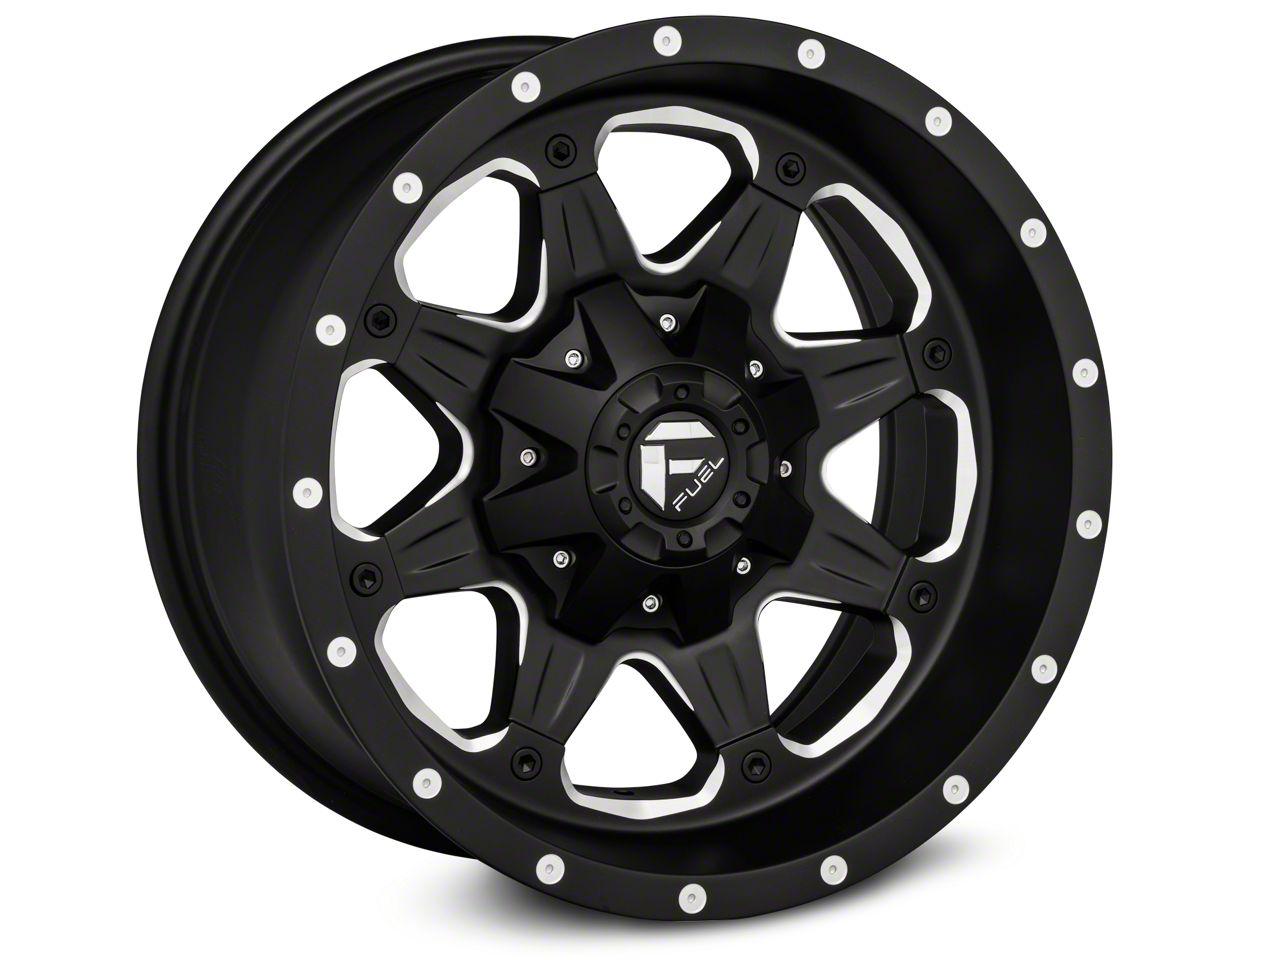 Fuel Wheels Boost Black Milled Wheel - 18x9 (18-19 Jeep Wrangler JL)